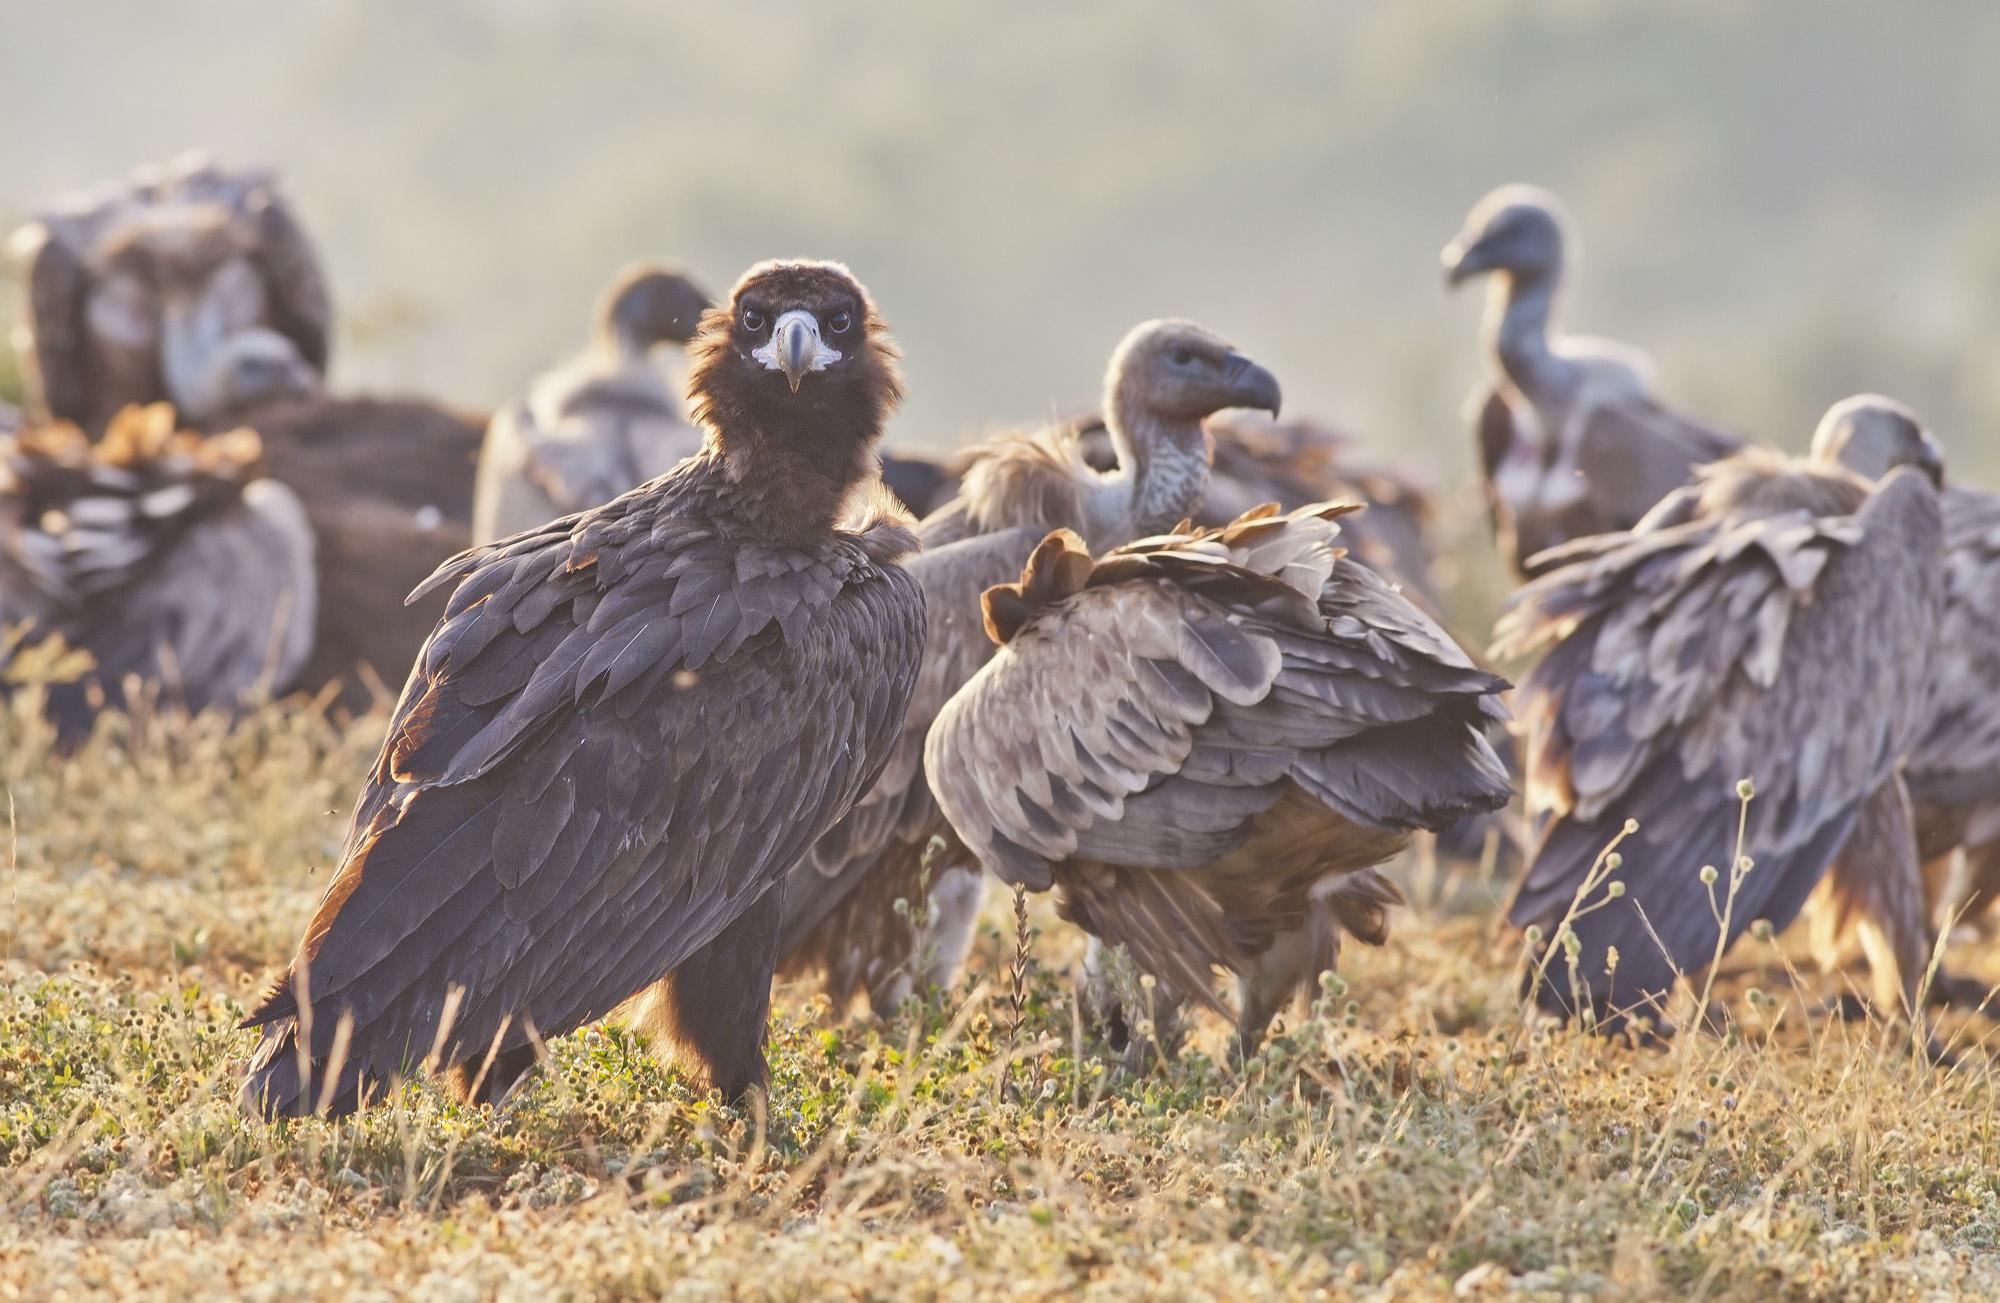 Black vulture and griffon vultures